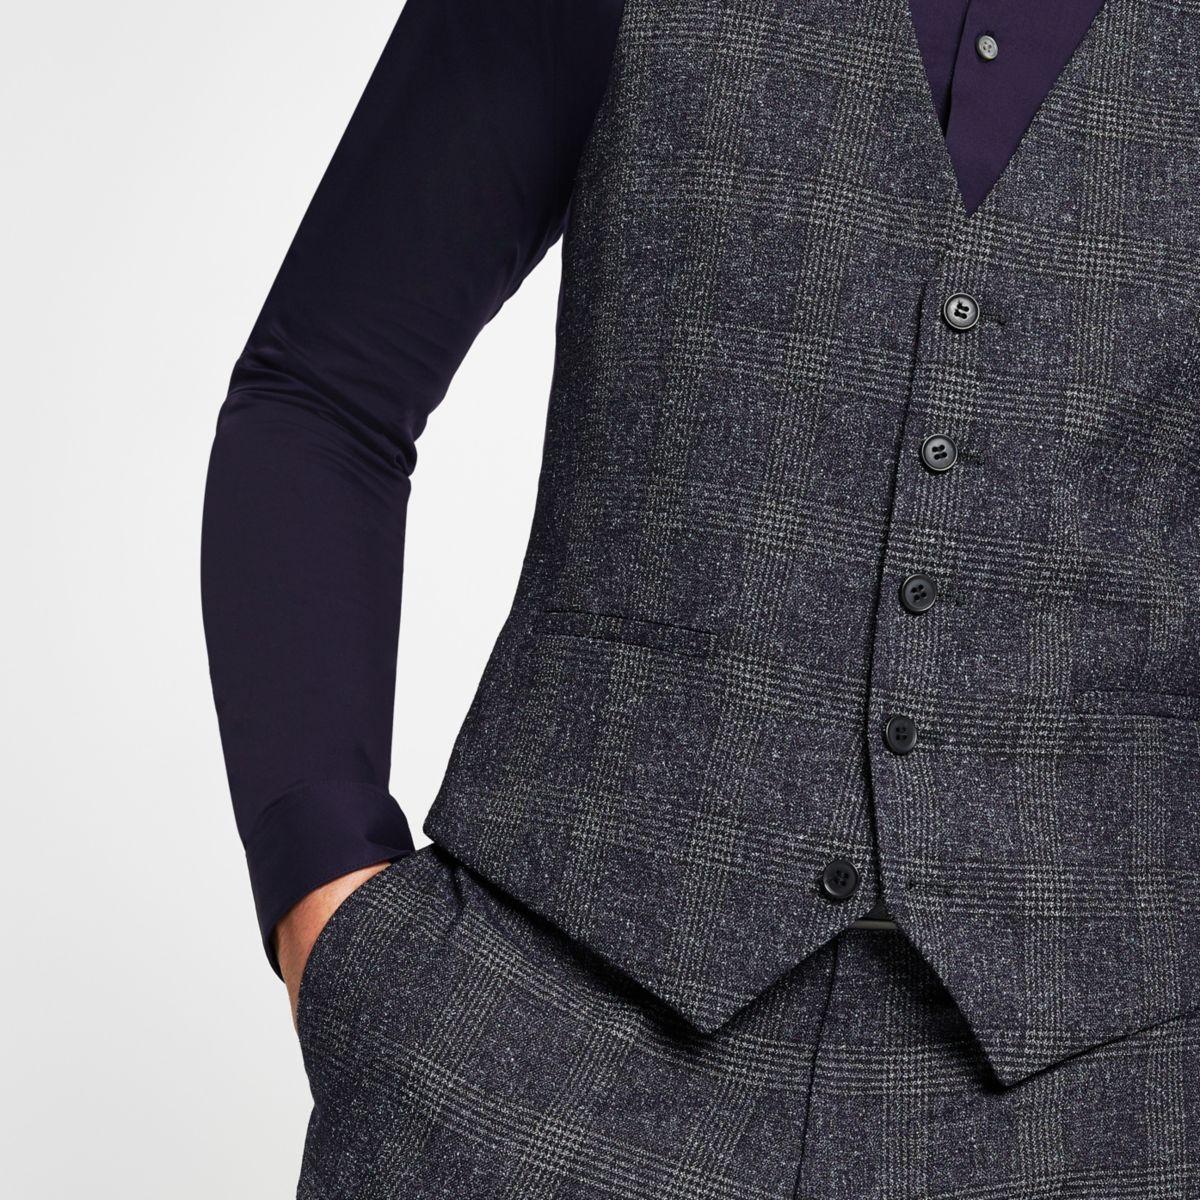 Farah blue check waistcoat